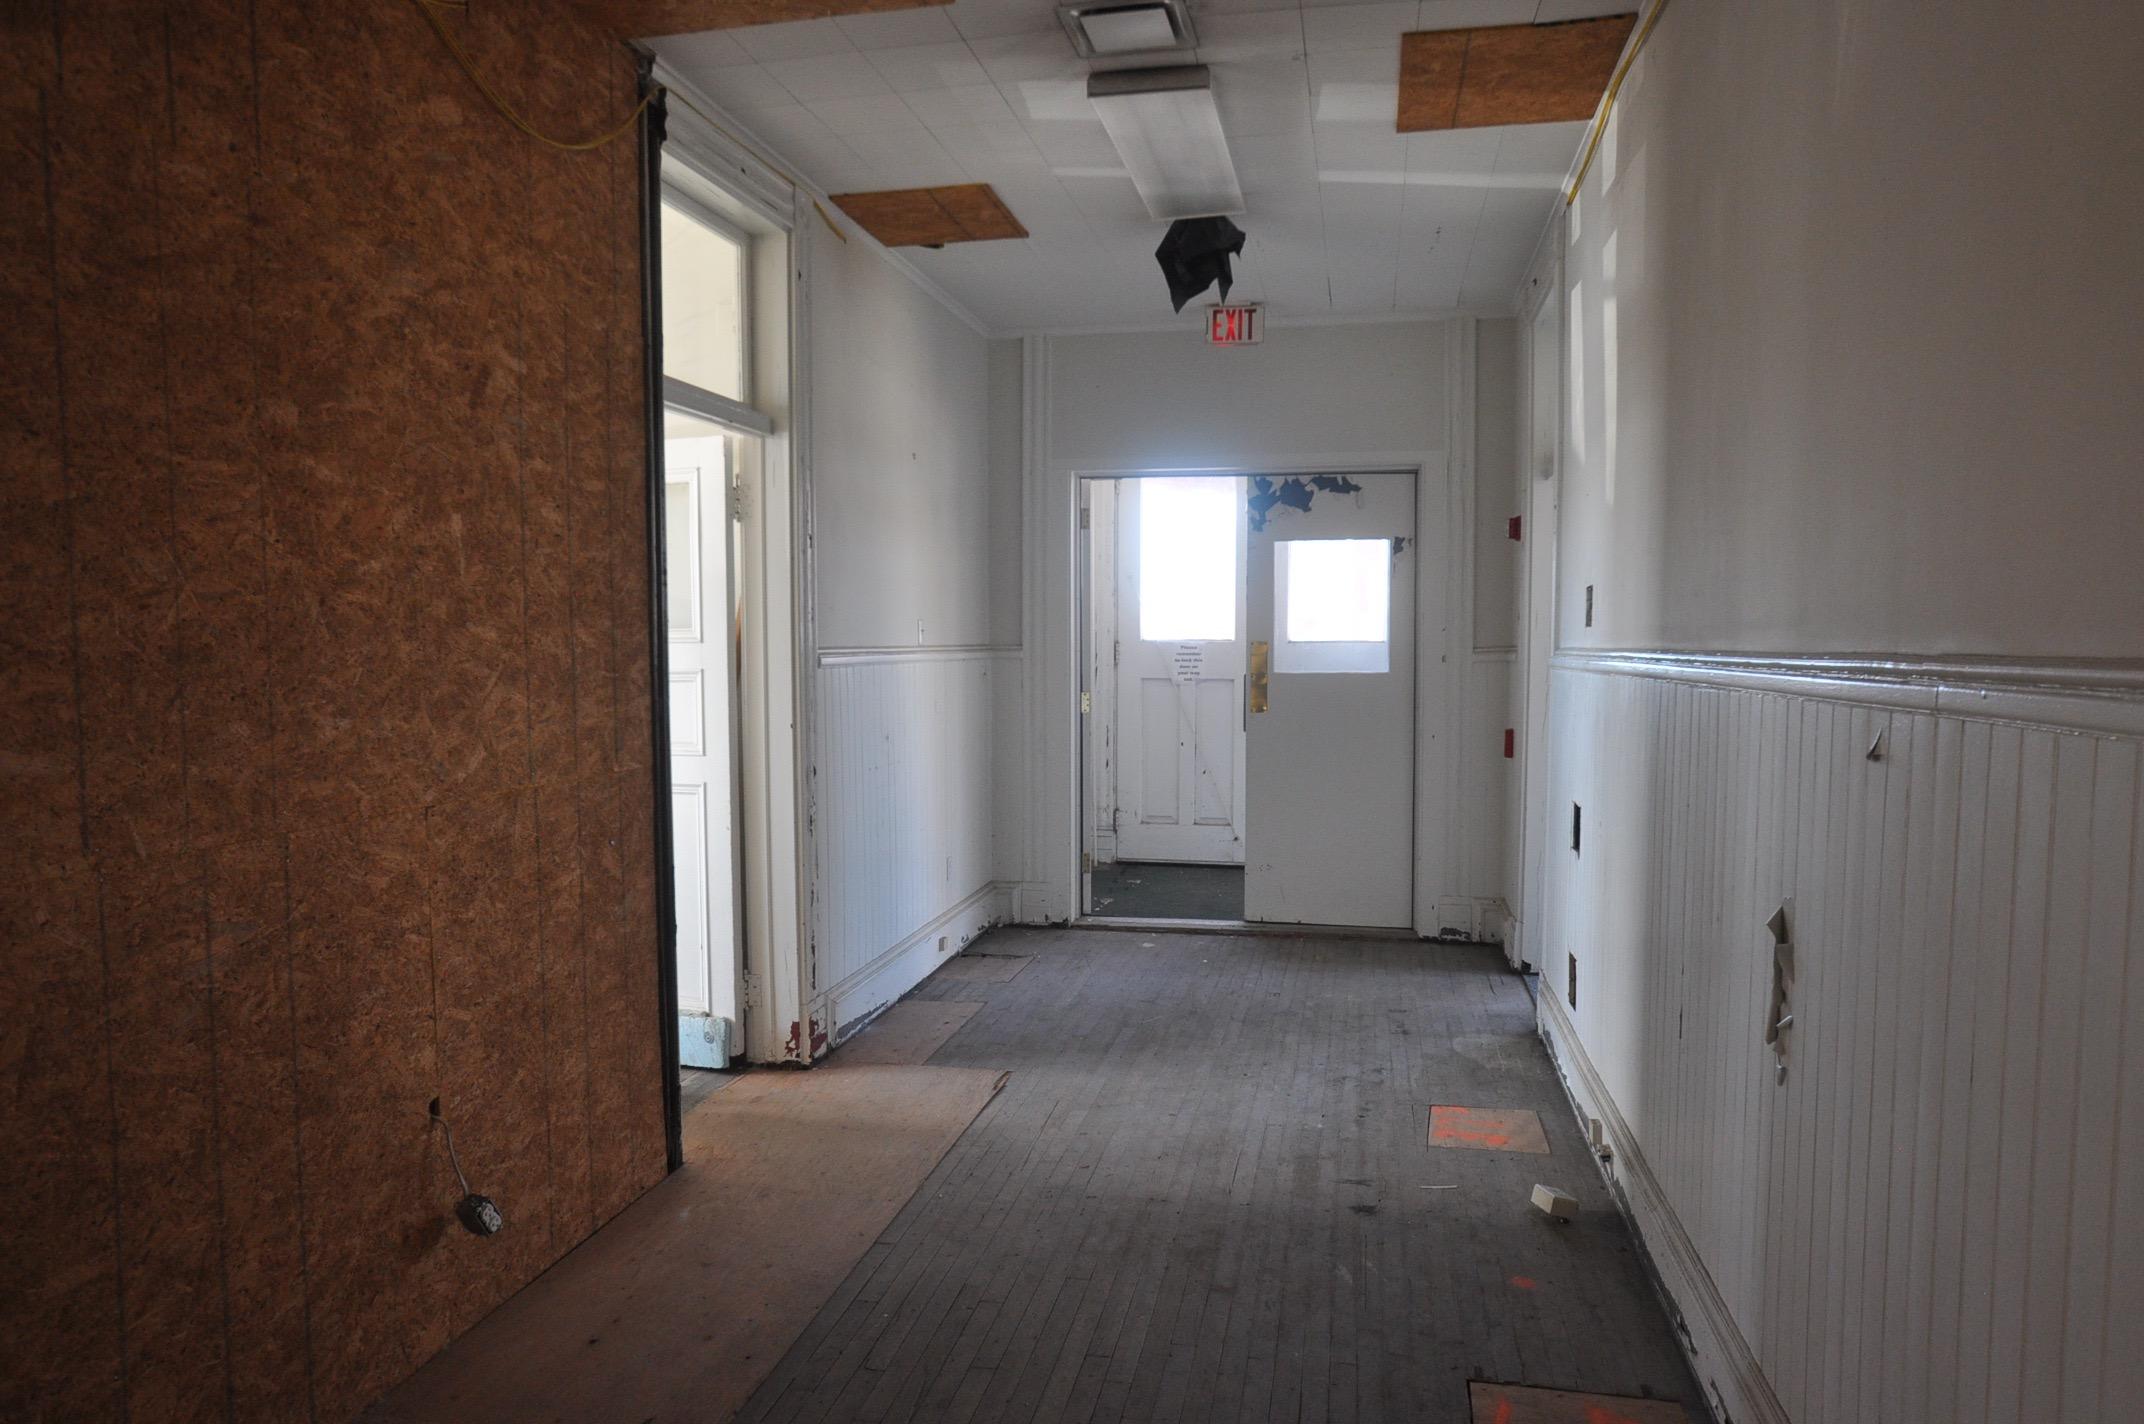 Photo 17 before-grand trunk - hallway.jpg